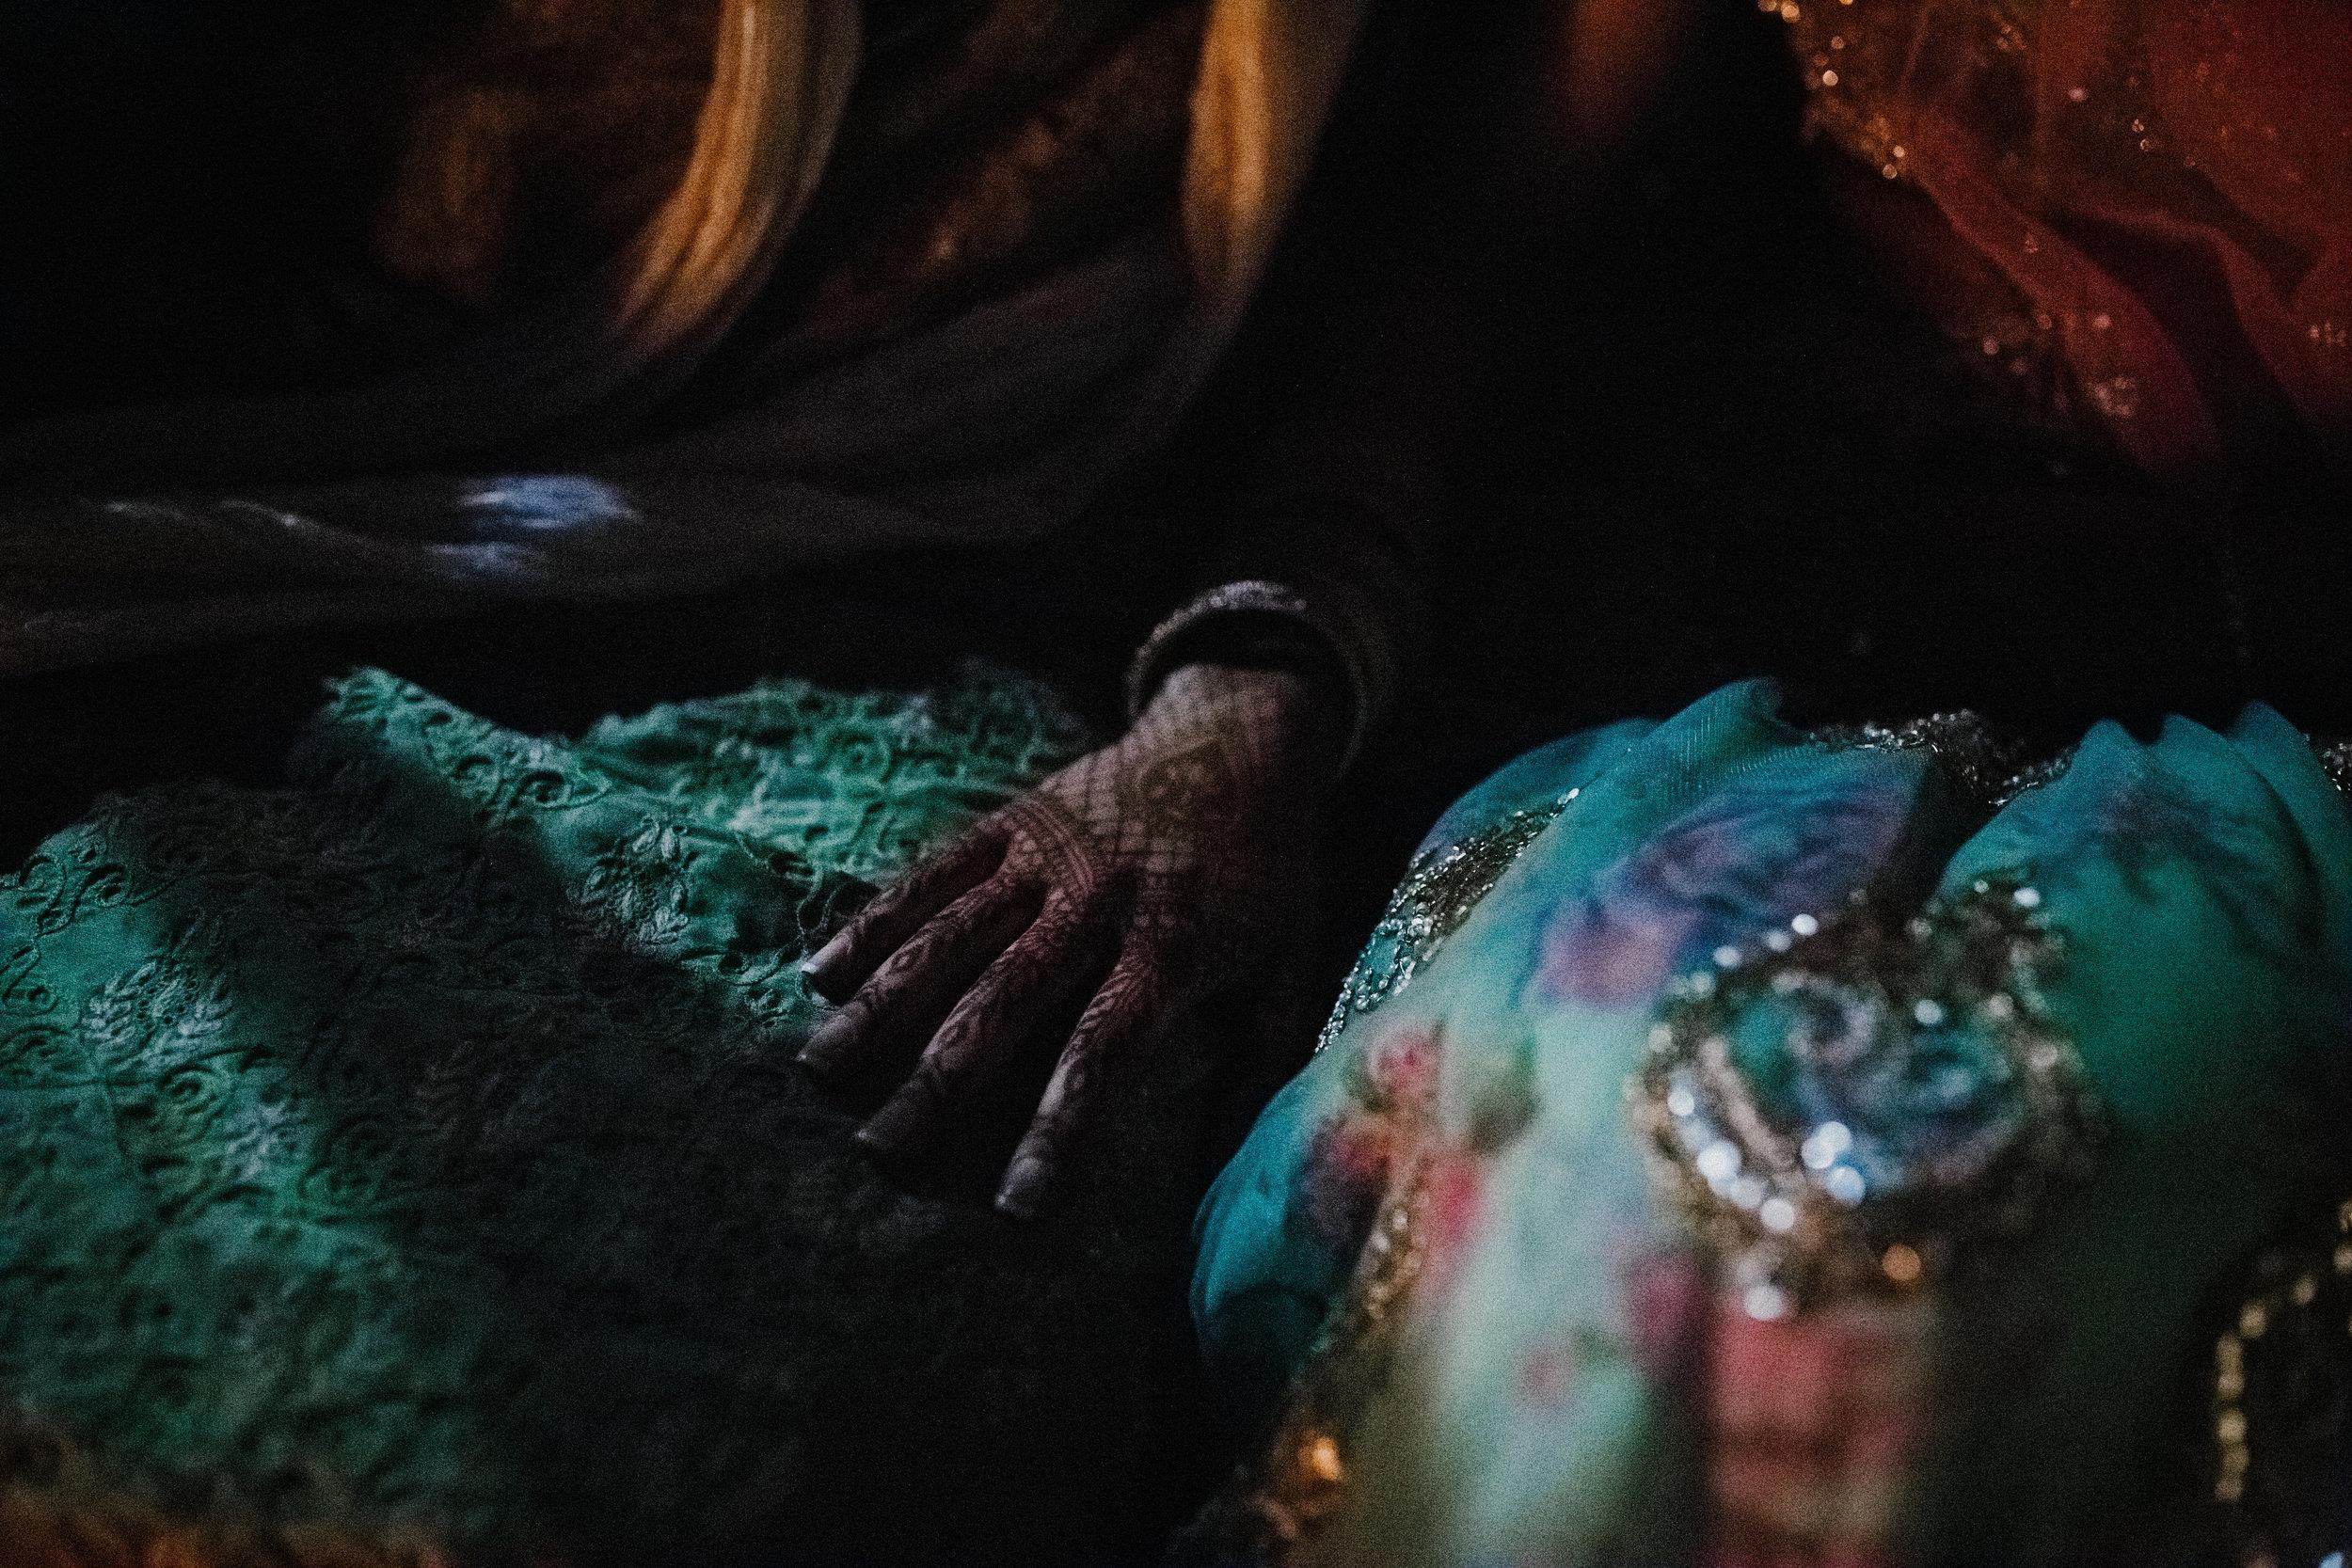 Aparna-Ankit-Patel-Shah-Detroit-Michigan-Shadow-Shine-Pictures-Photography-Indian-Cinematic-Wedding